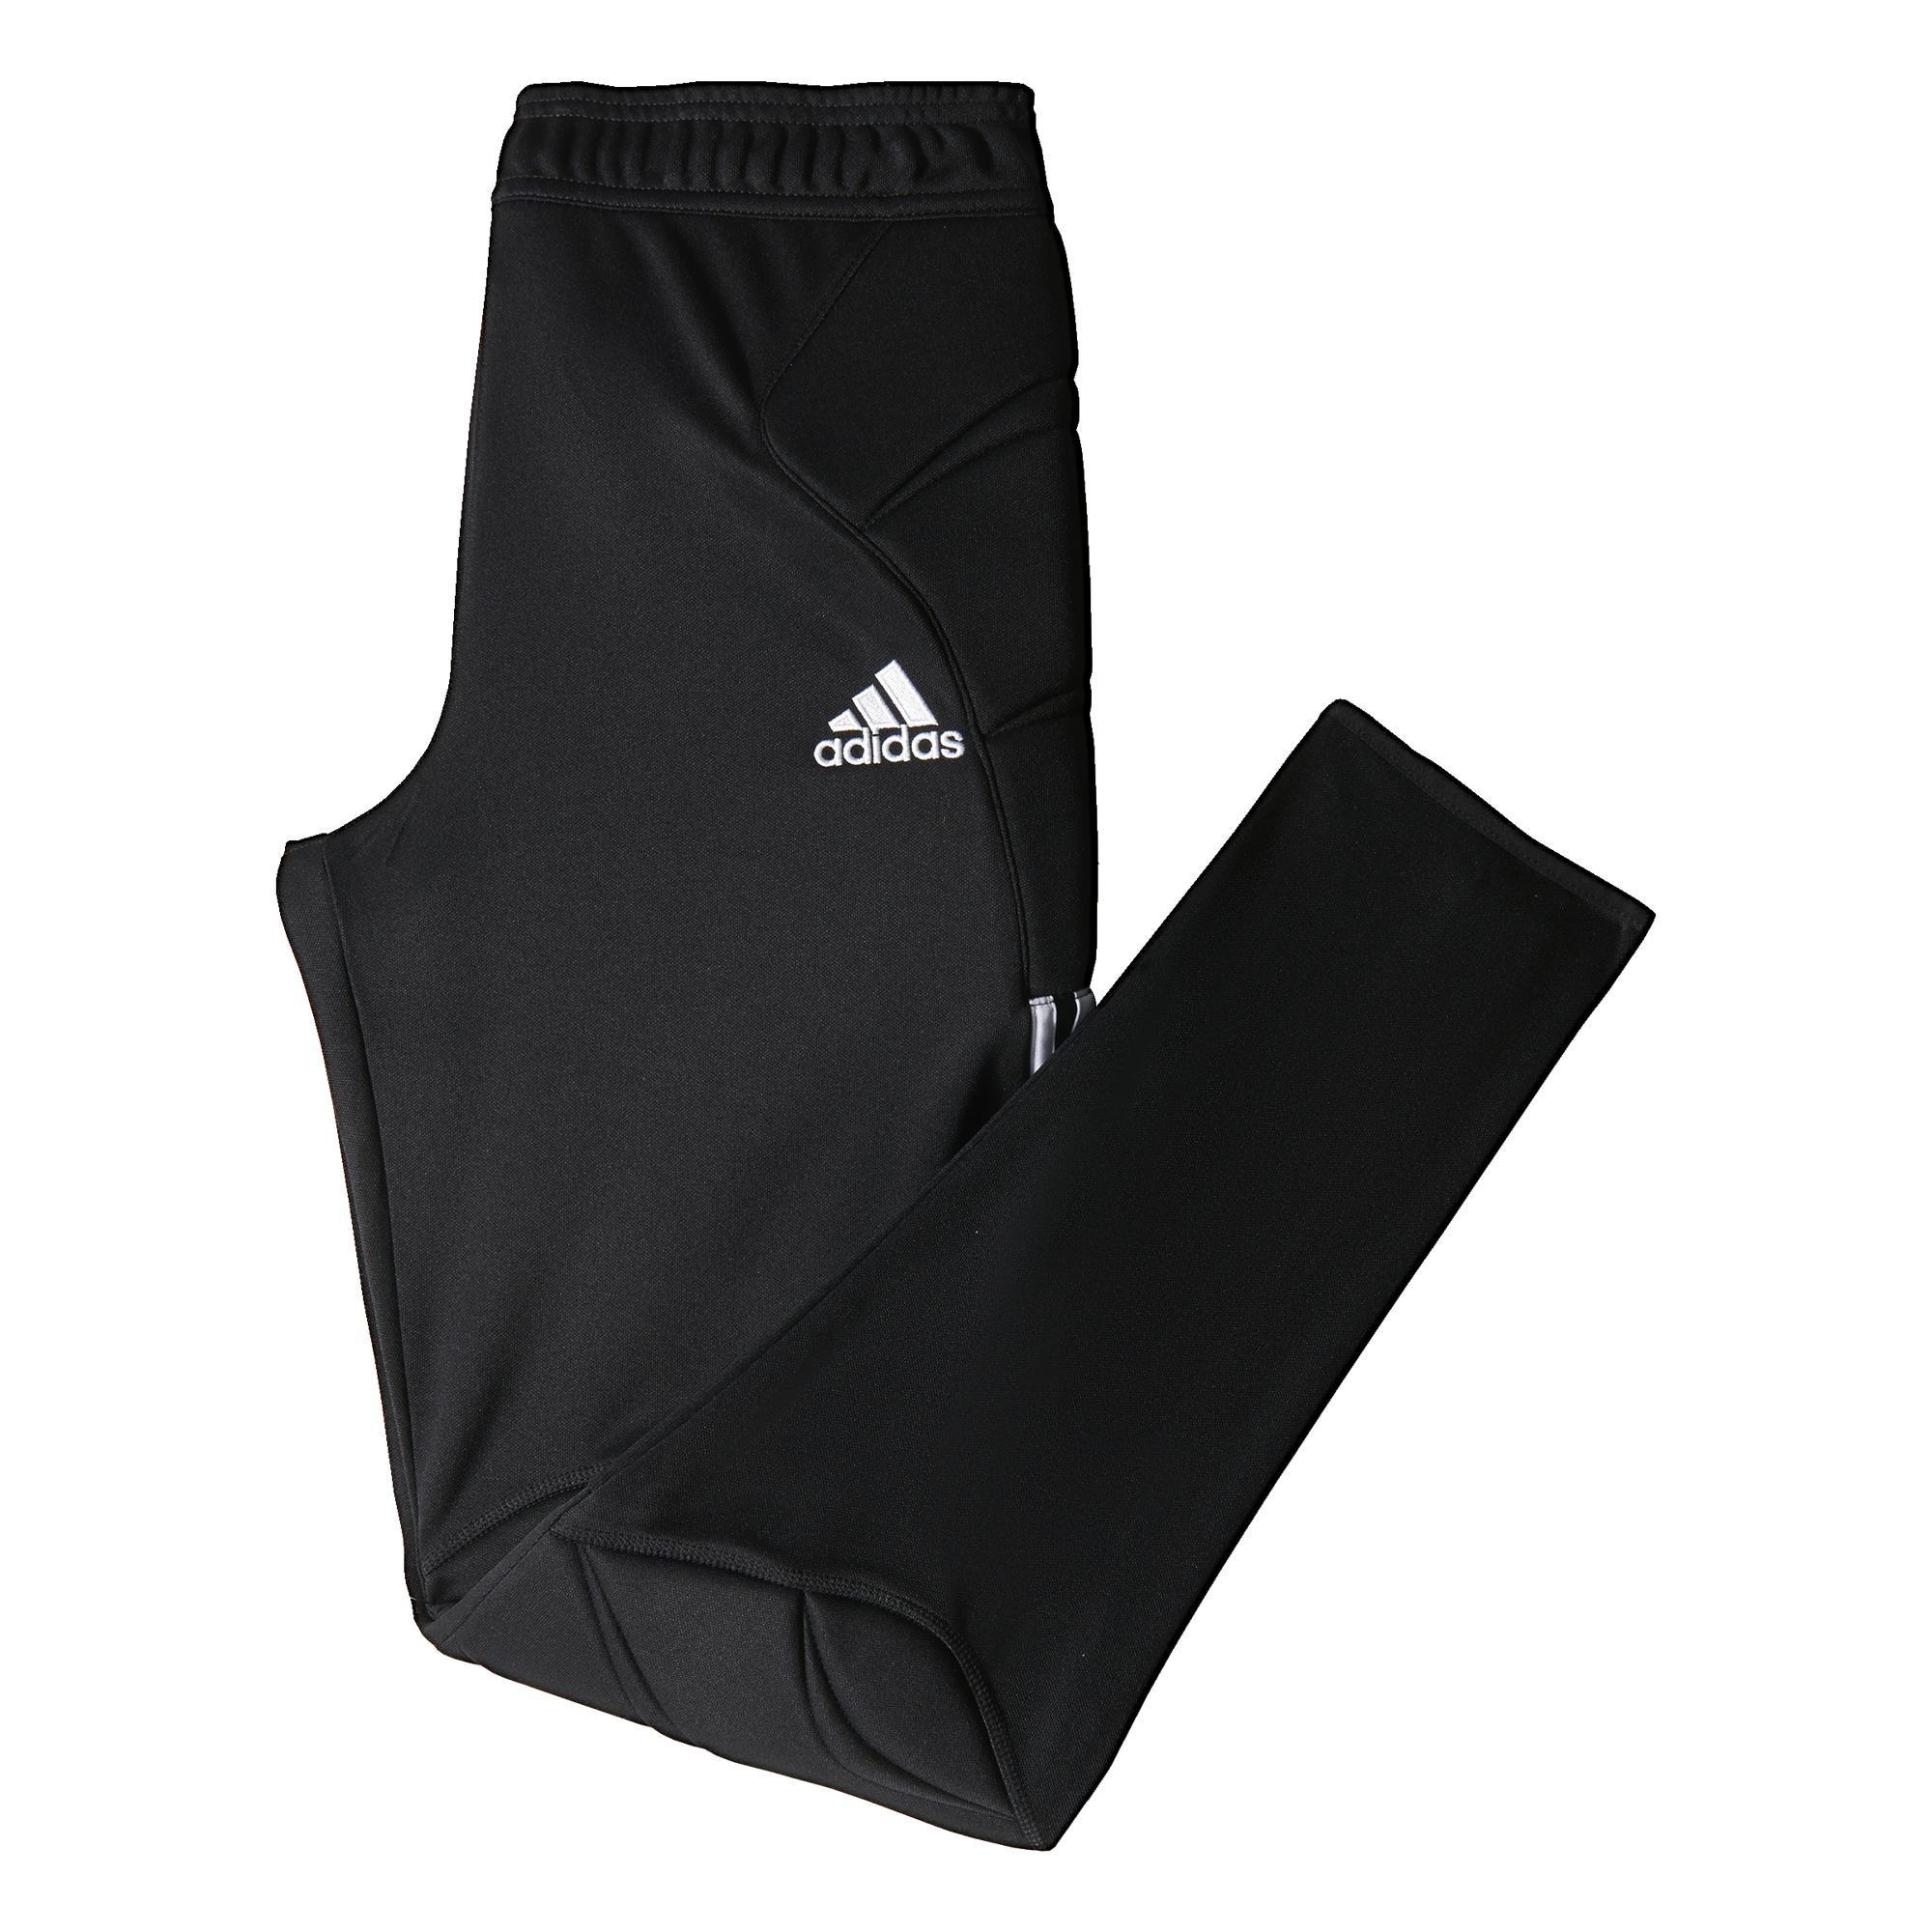 b02f61e016962 spodnie bramkarskie adidas Tierro 13 Junior Z11474